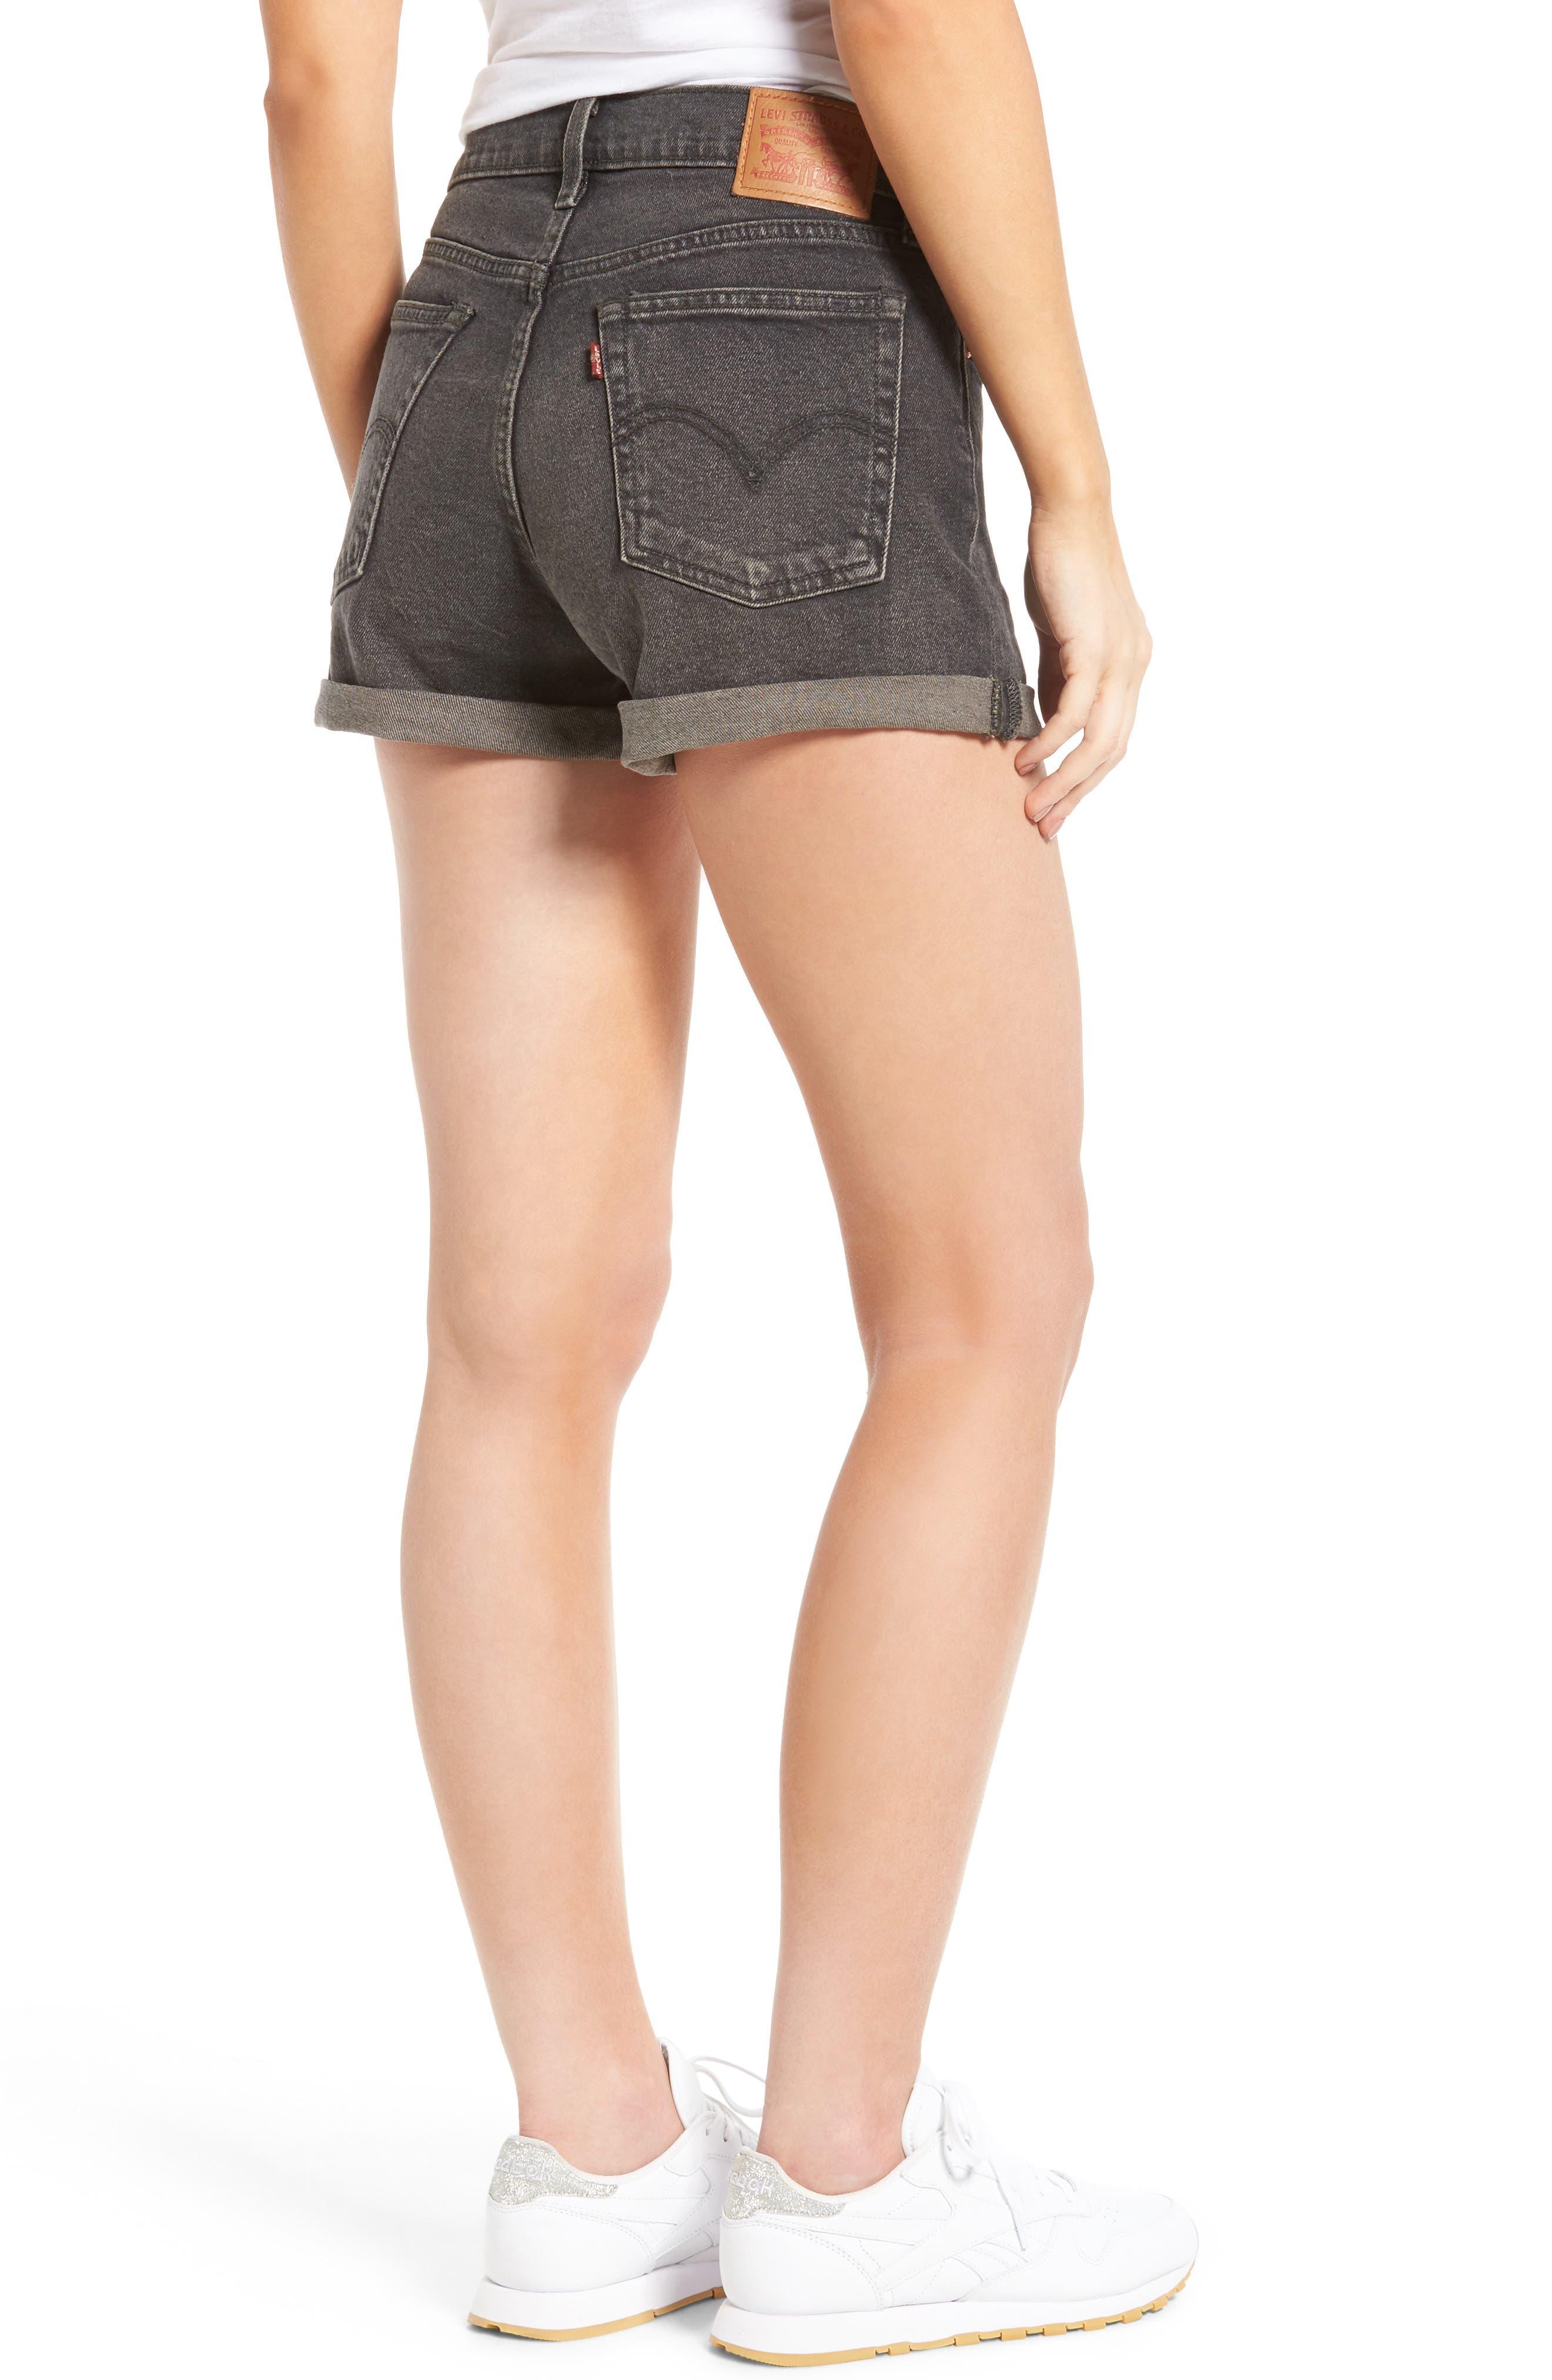 Wedgie High Waist Denim Shorts,                             Alternate thumbnail 2, color,                             001